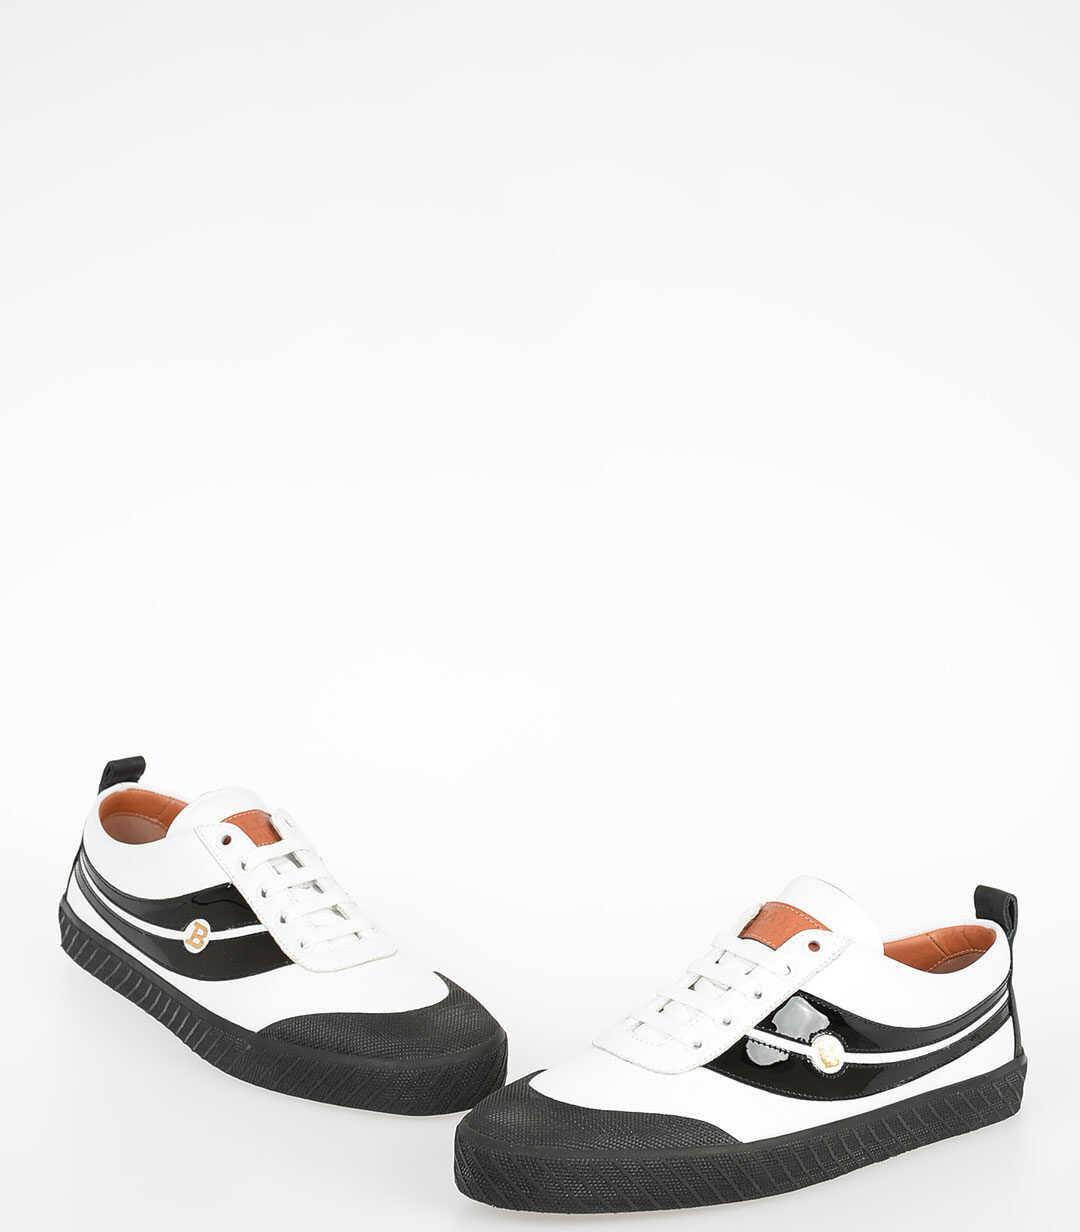 Bally Leather SMAKE Sneakers BLACK & WHITE